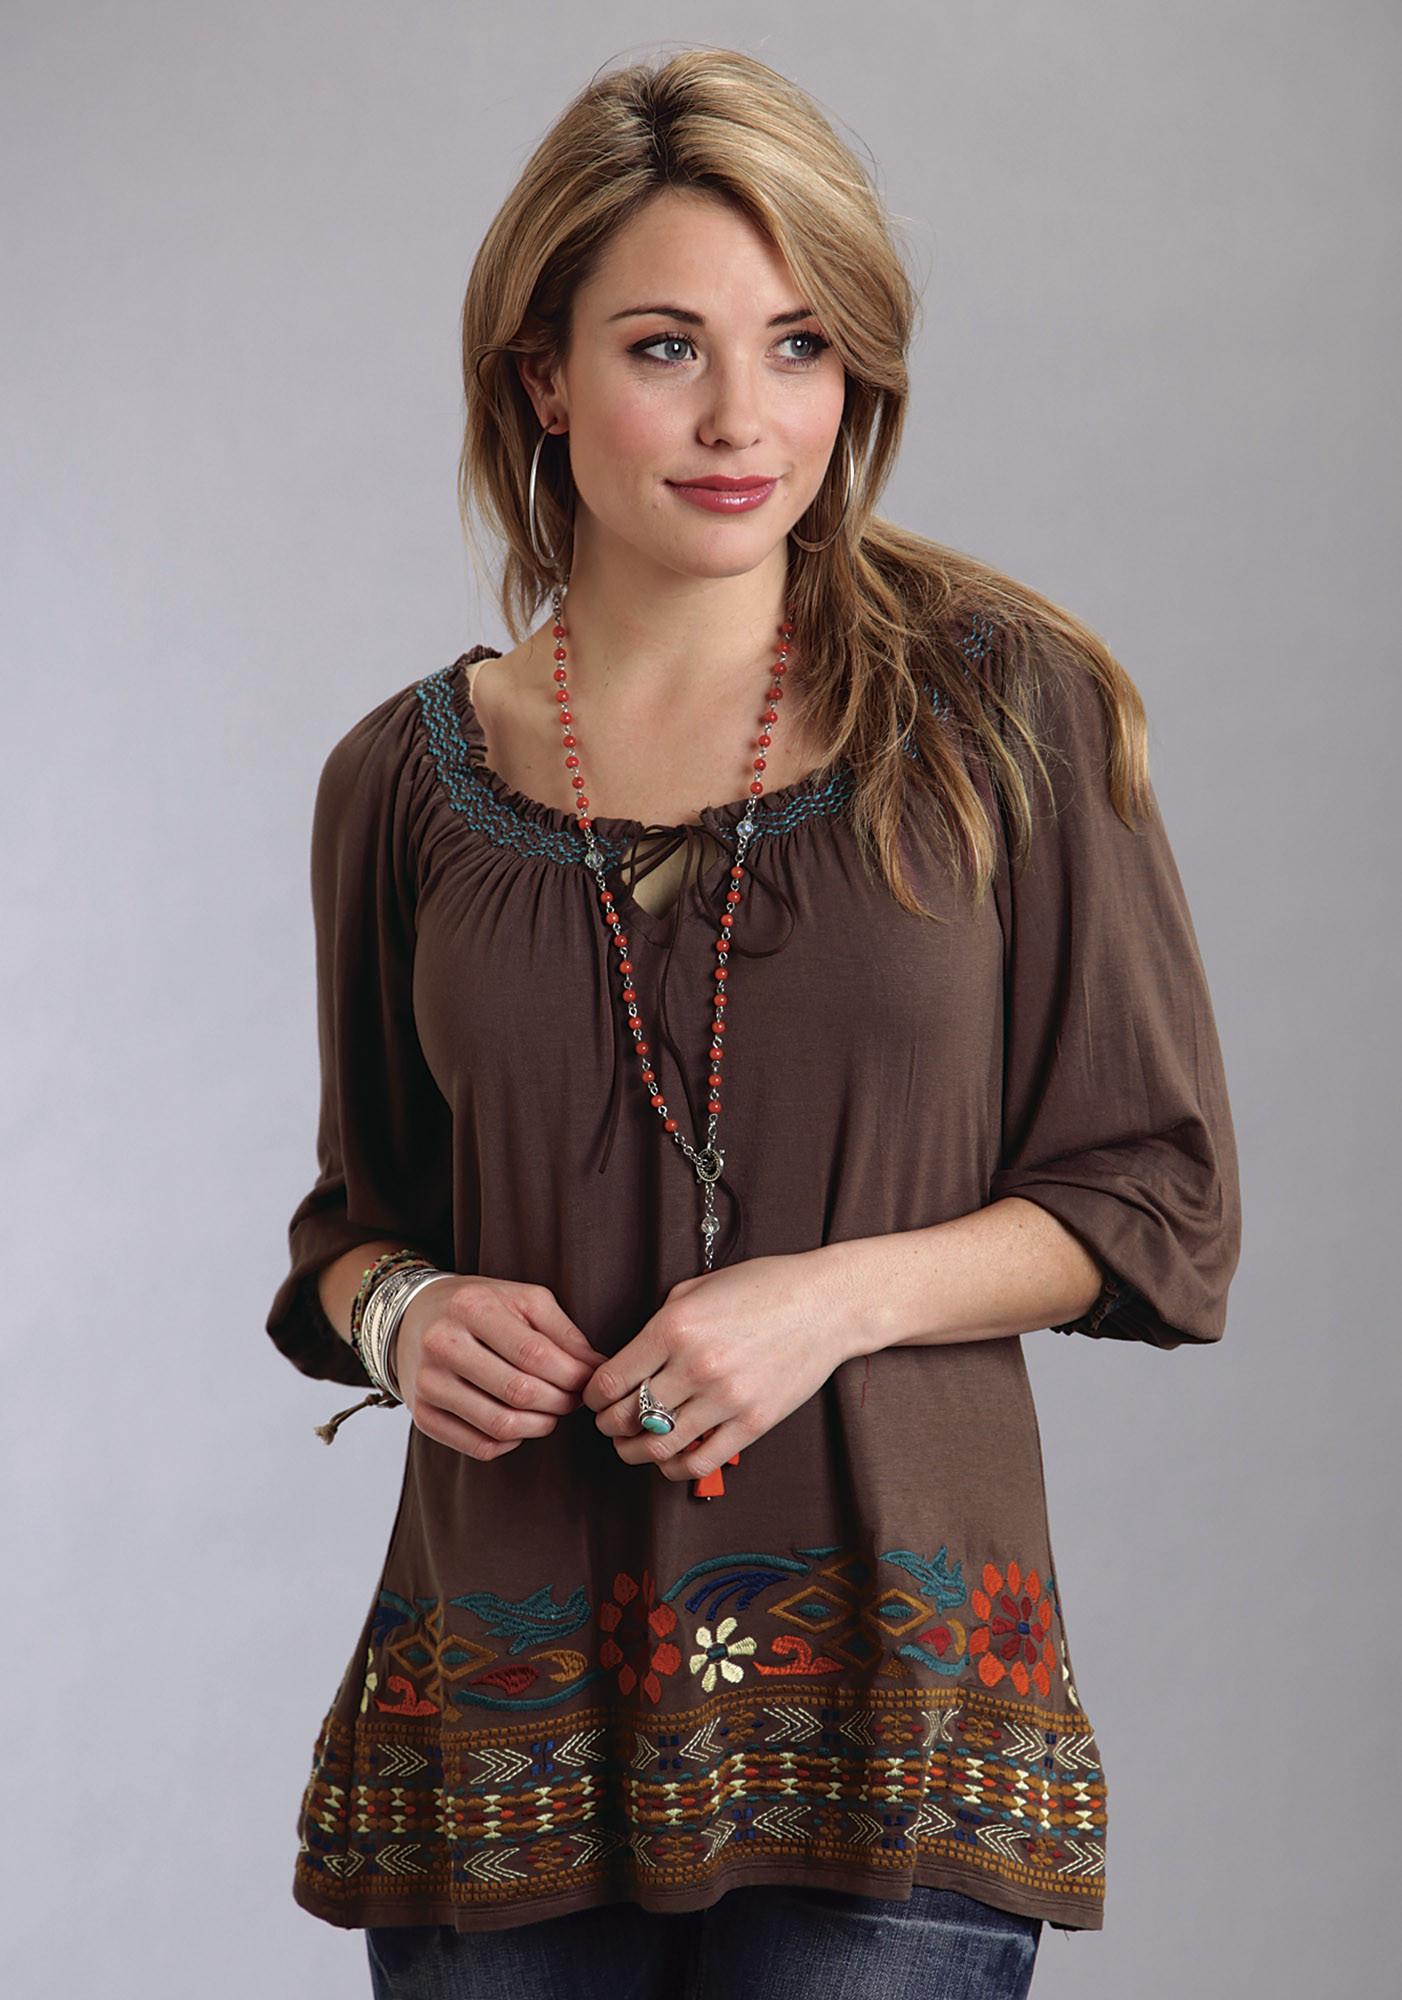 buy women's shirts online